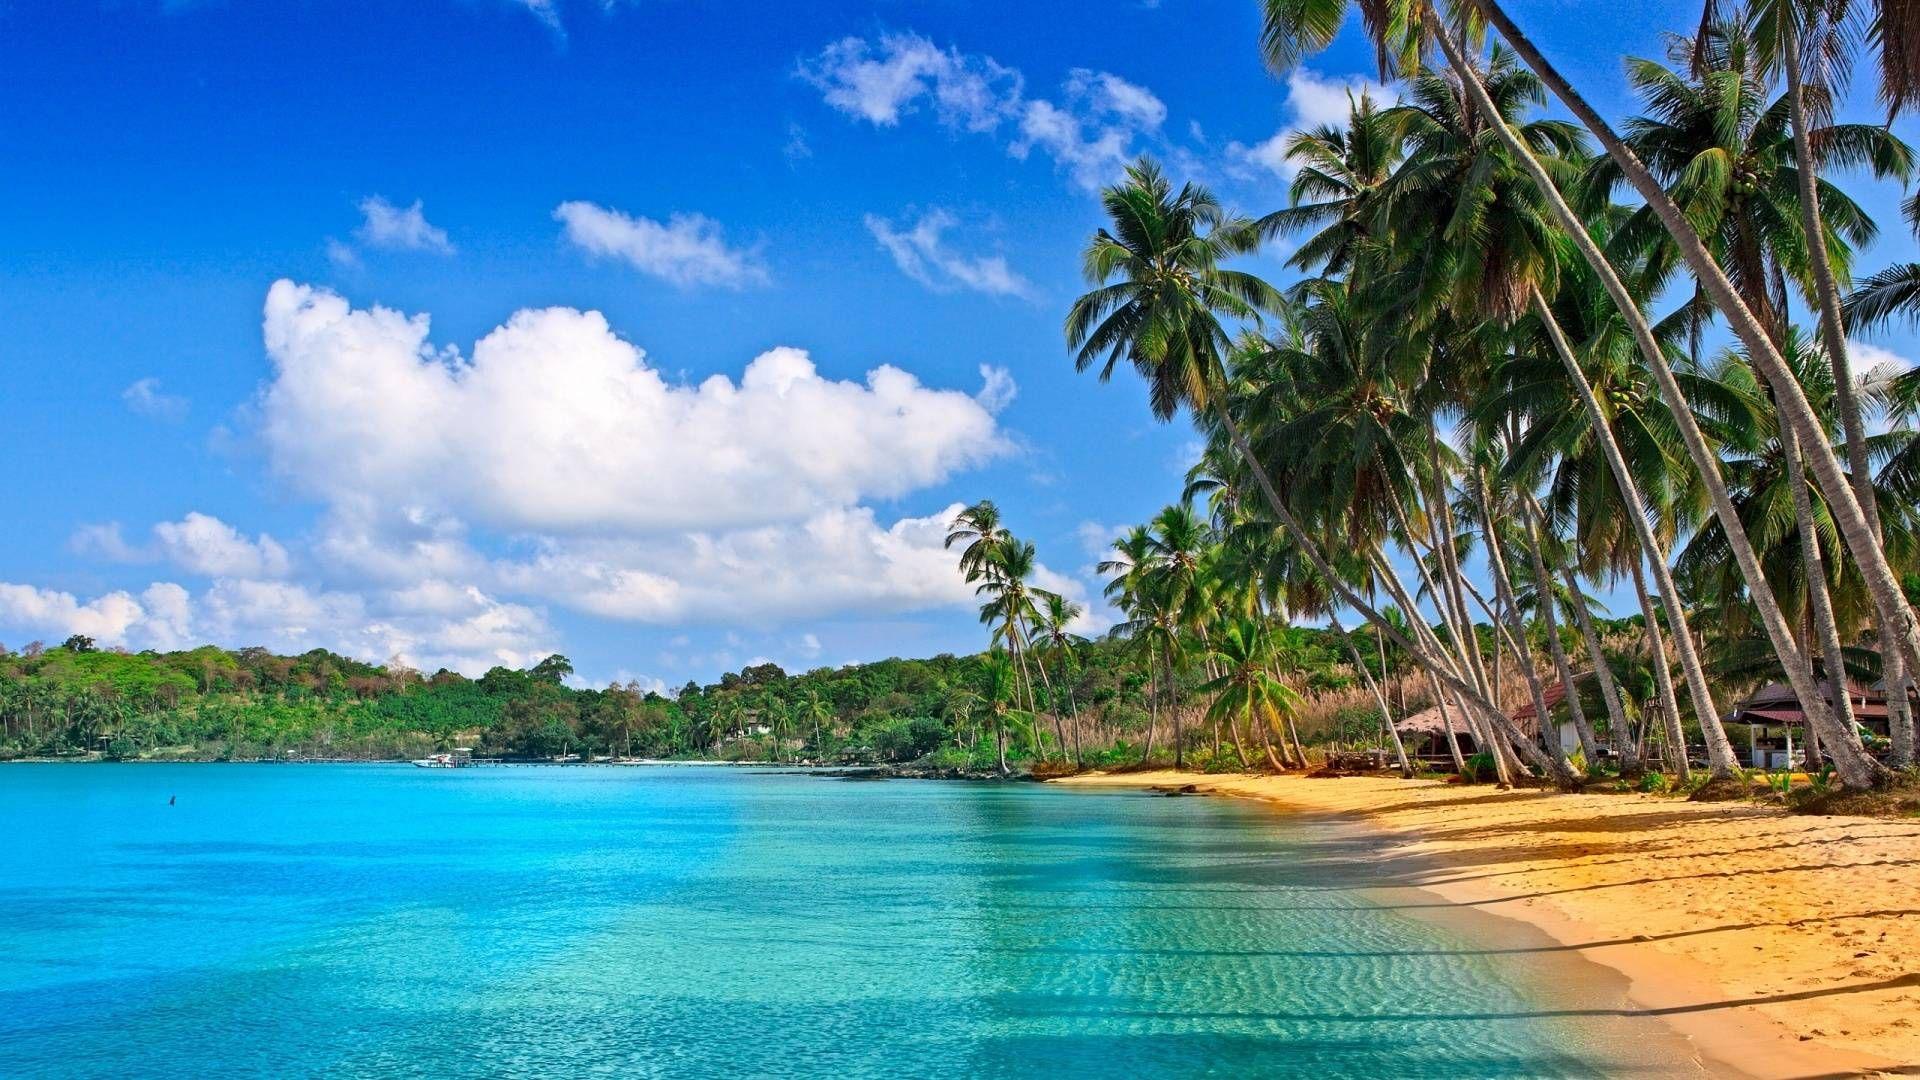 Free Download Hd Nature Wallpapers Beach Photos Beach Wallpaper Beach Images